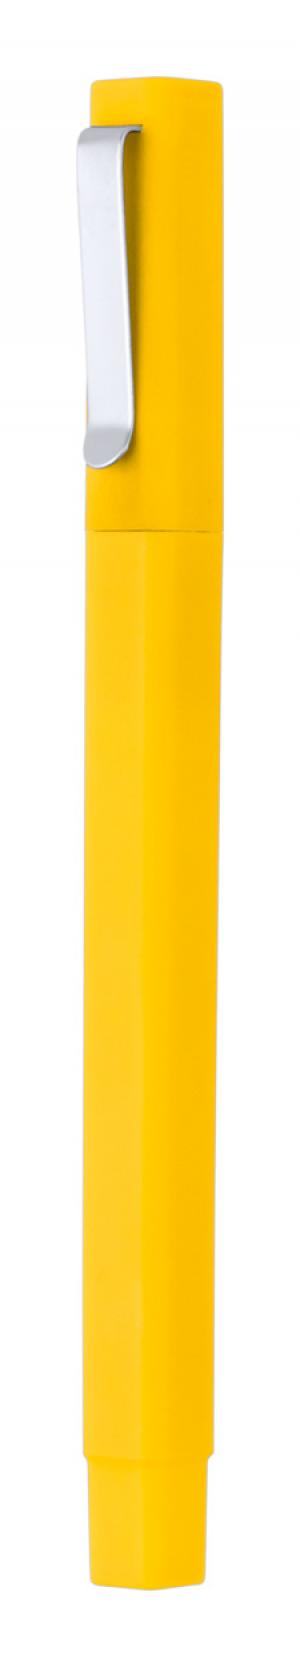 Verslo dovanos Quarex (ballpoint pen)